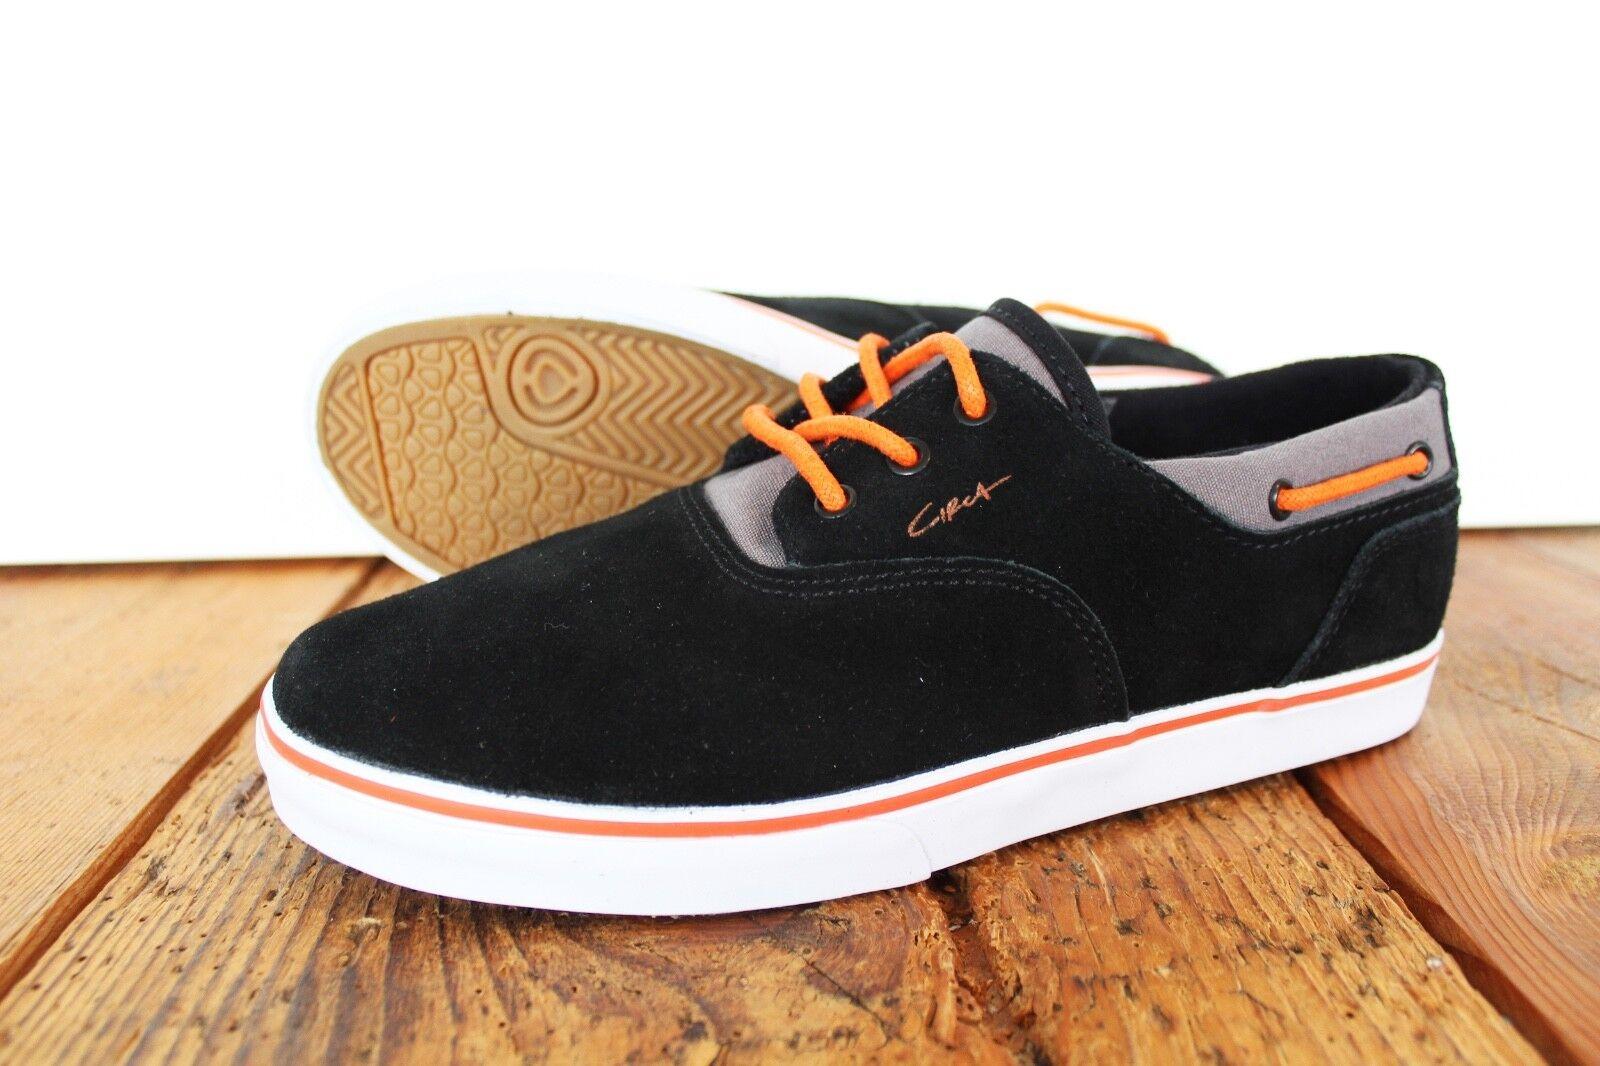 CIRCA FOOTWEAR VALEO SHOE NEU BLACK GR US 7 EUR 39 CIRCA